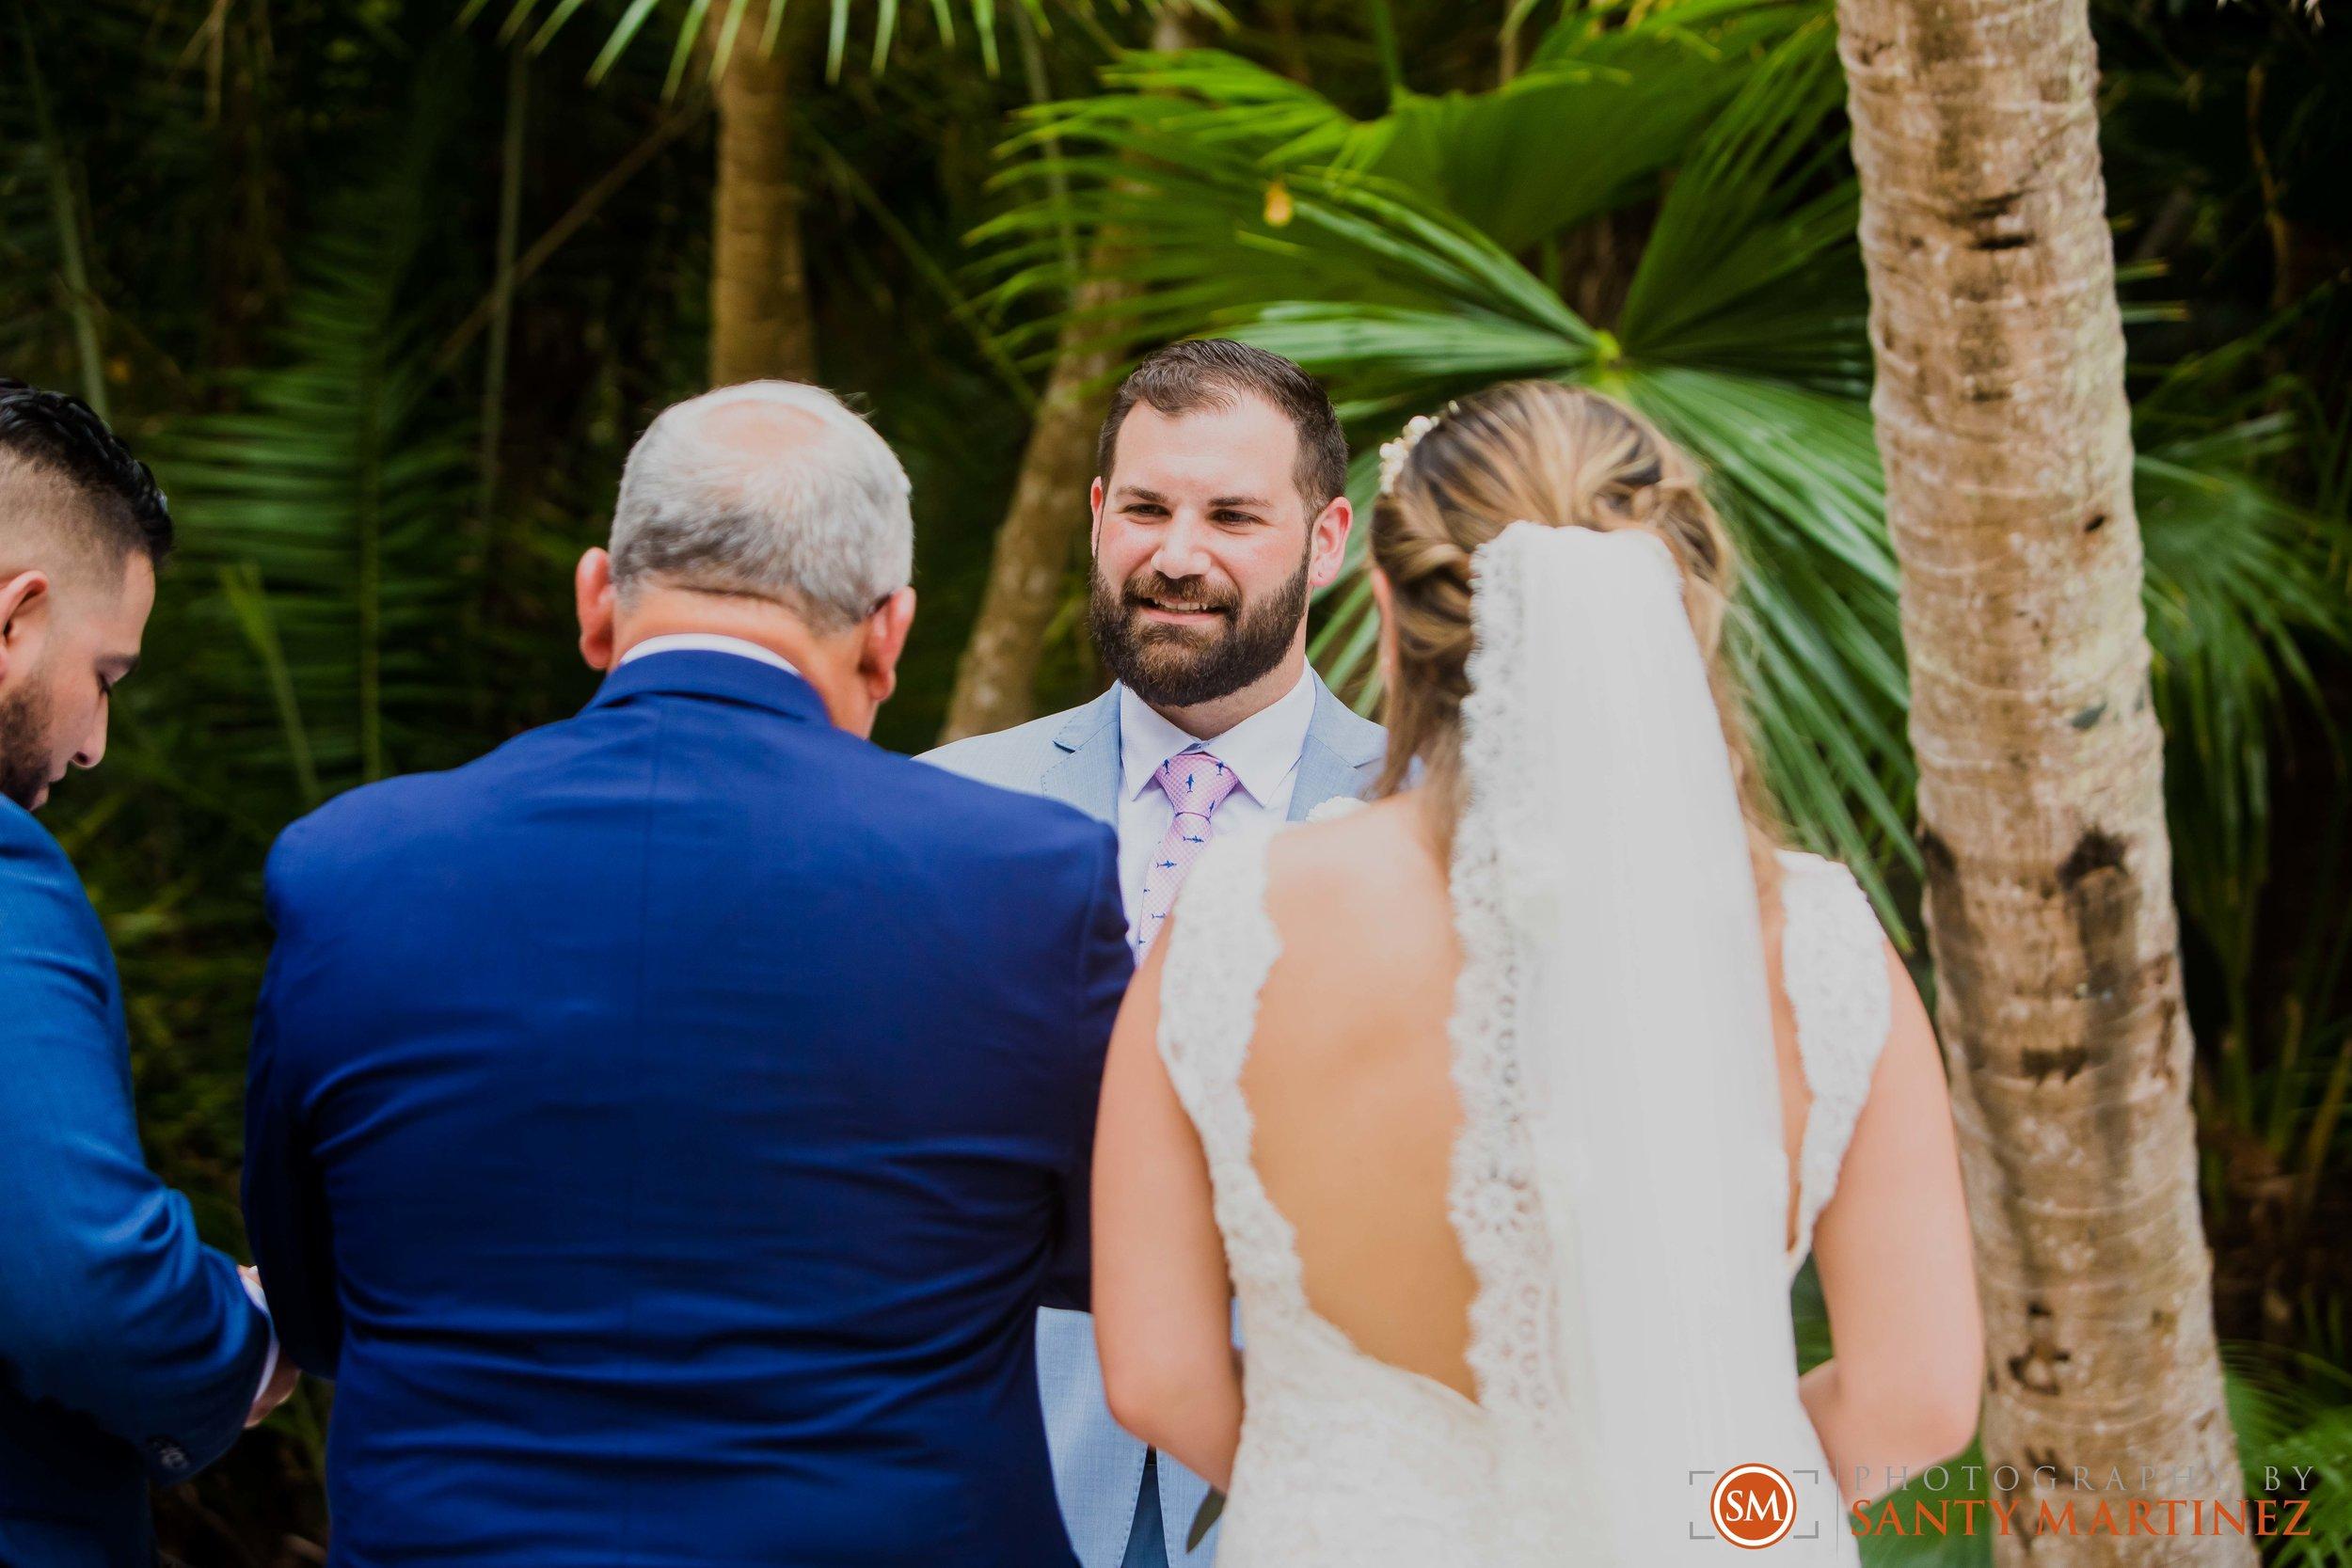 Wedding Bonnet House - Santy Martinez Photography-31.jpg